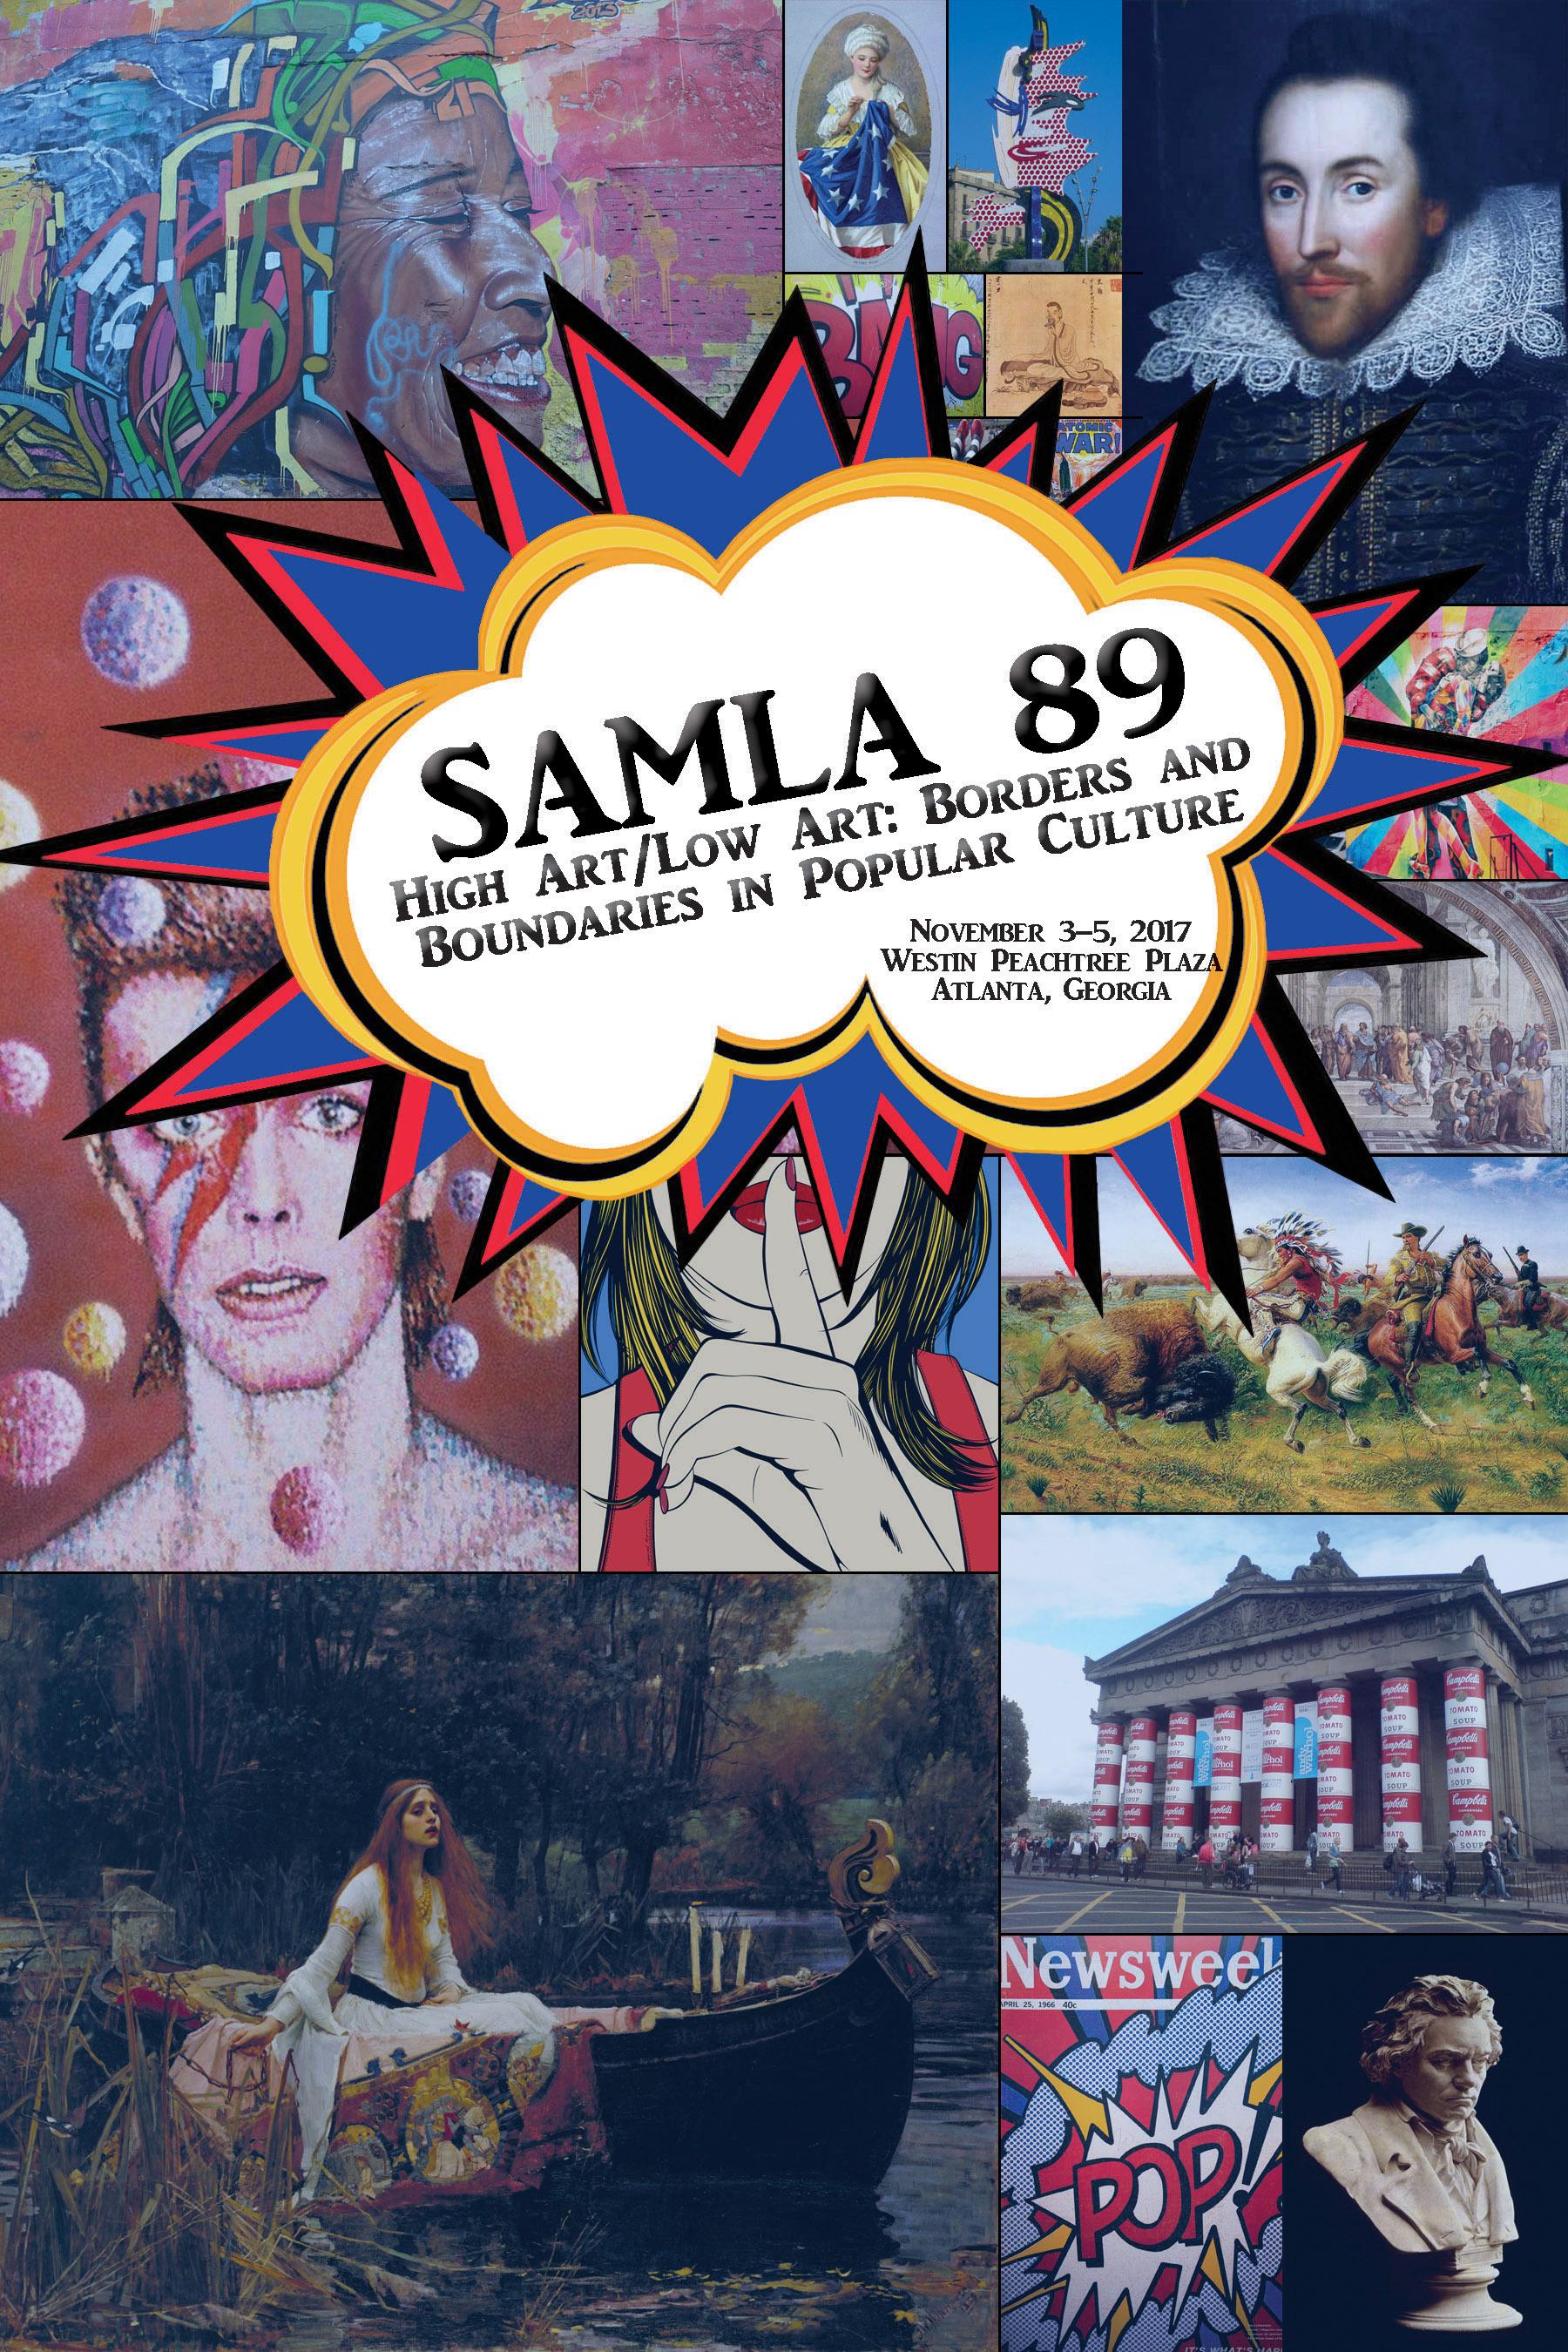 SAMLA 89 Program Cover